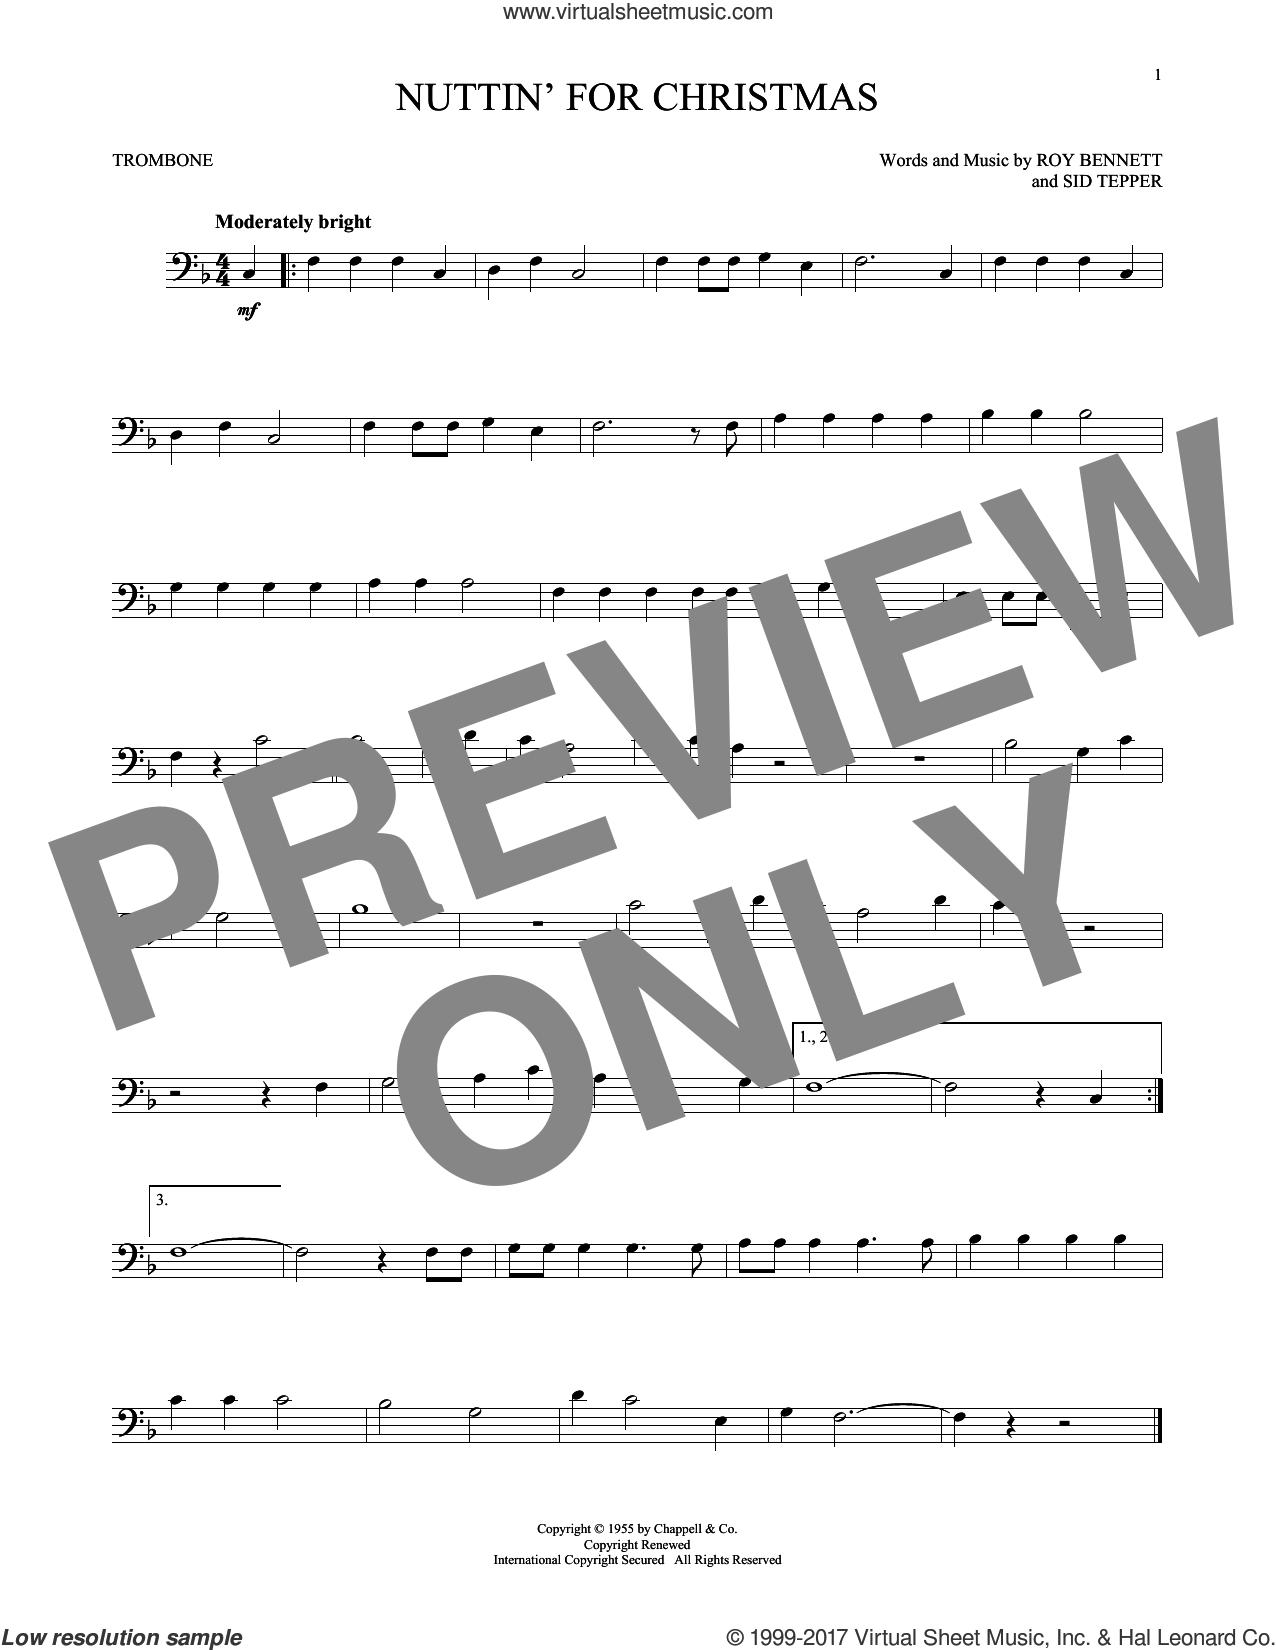 Nuttin' For Christmas sheet music for trombone solo by Sid Tepper and Roy Bennett, intermediate skill level